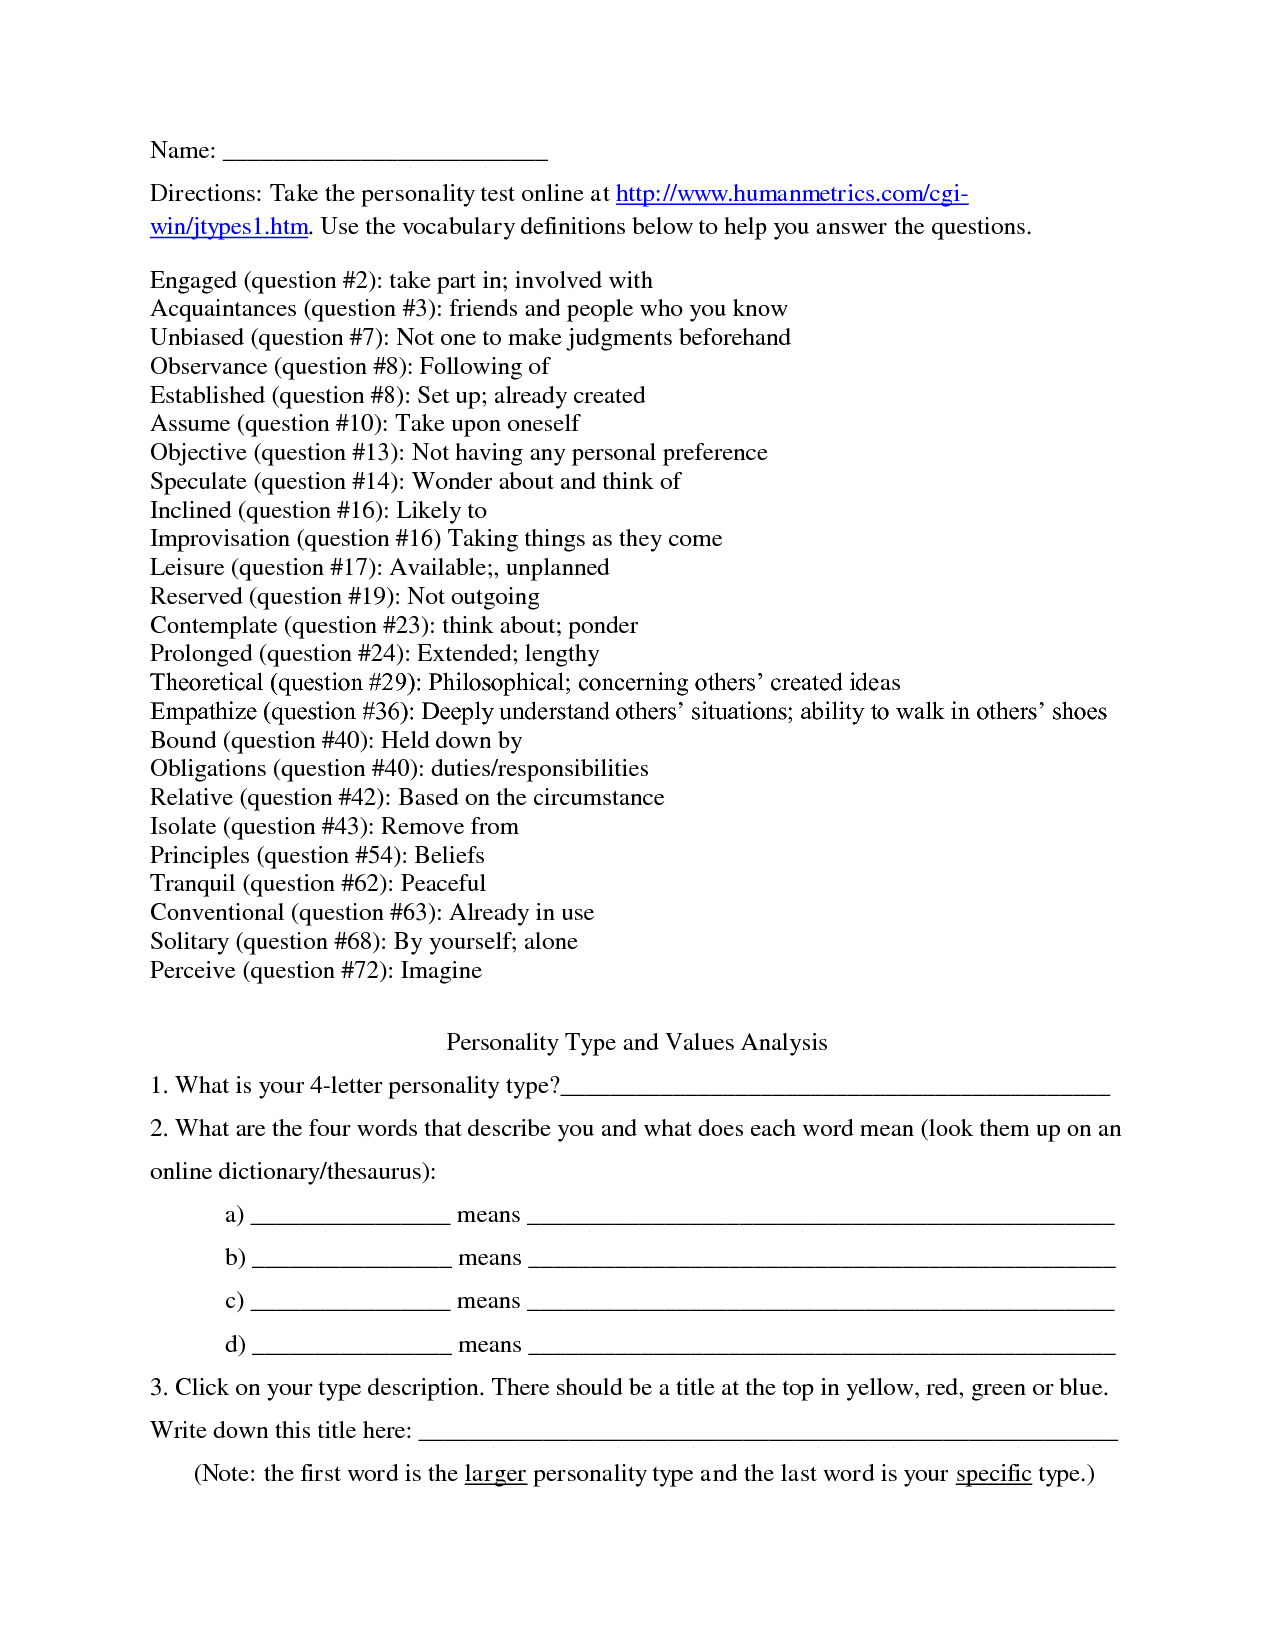 Personality types worksheet work handouts pinterest personality types worksheet fandeluxe Images